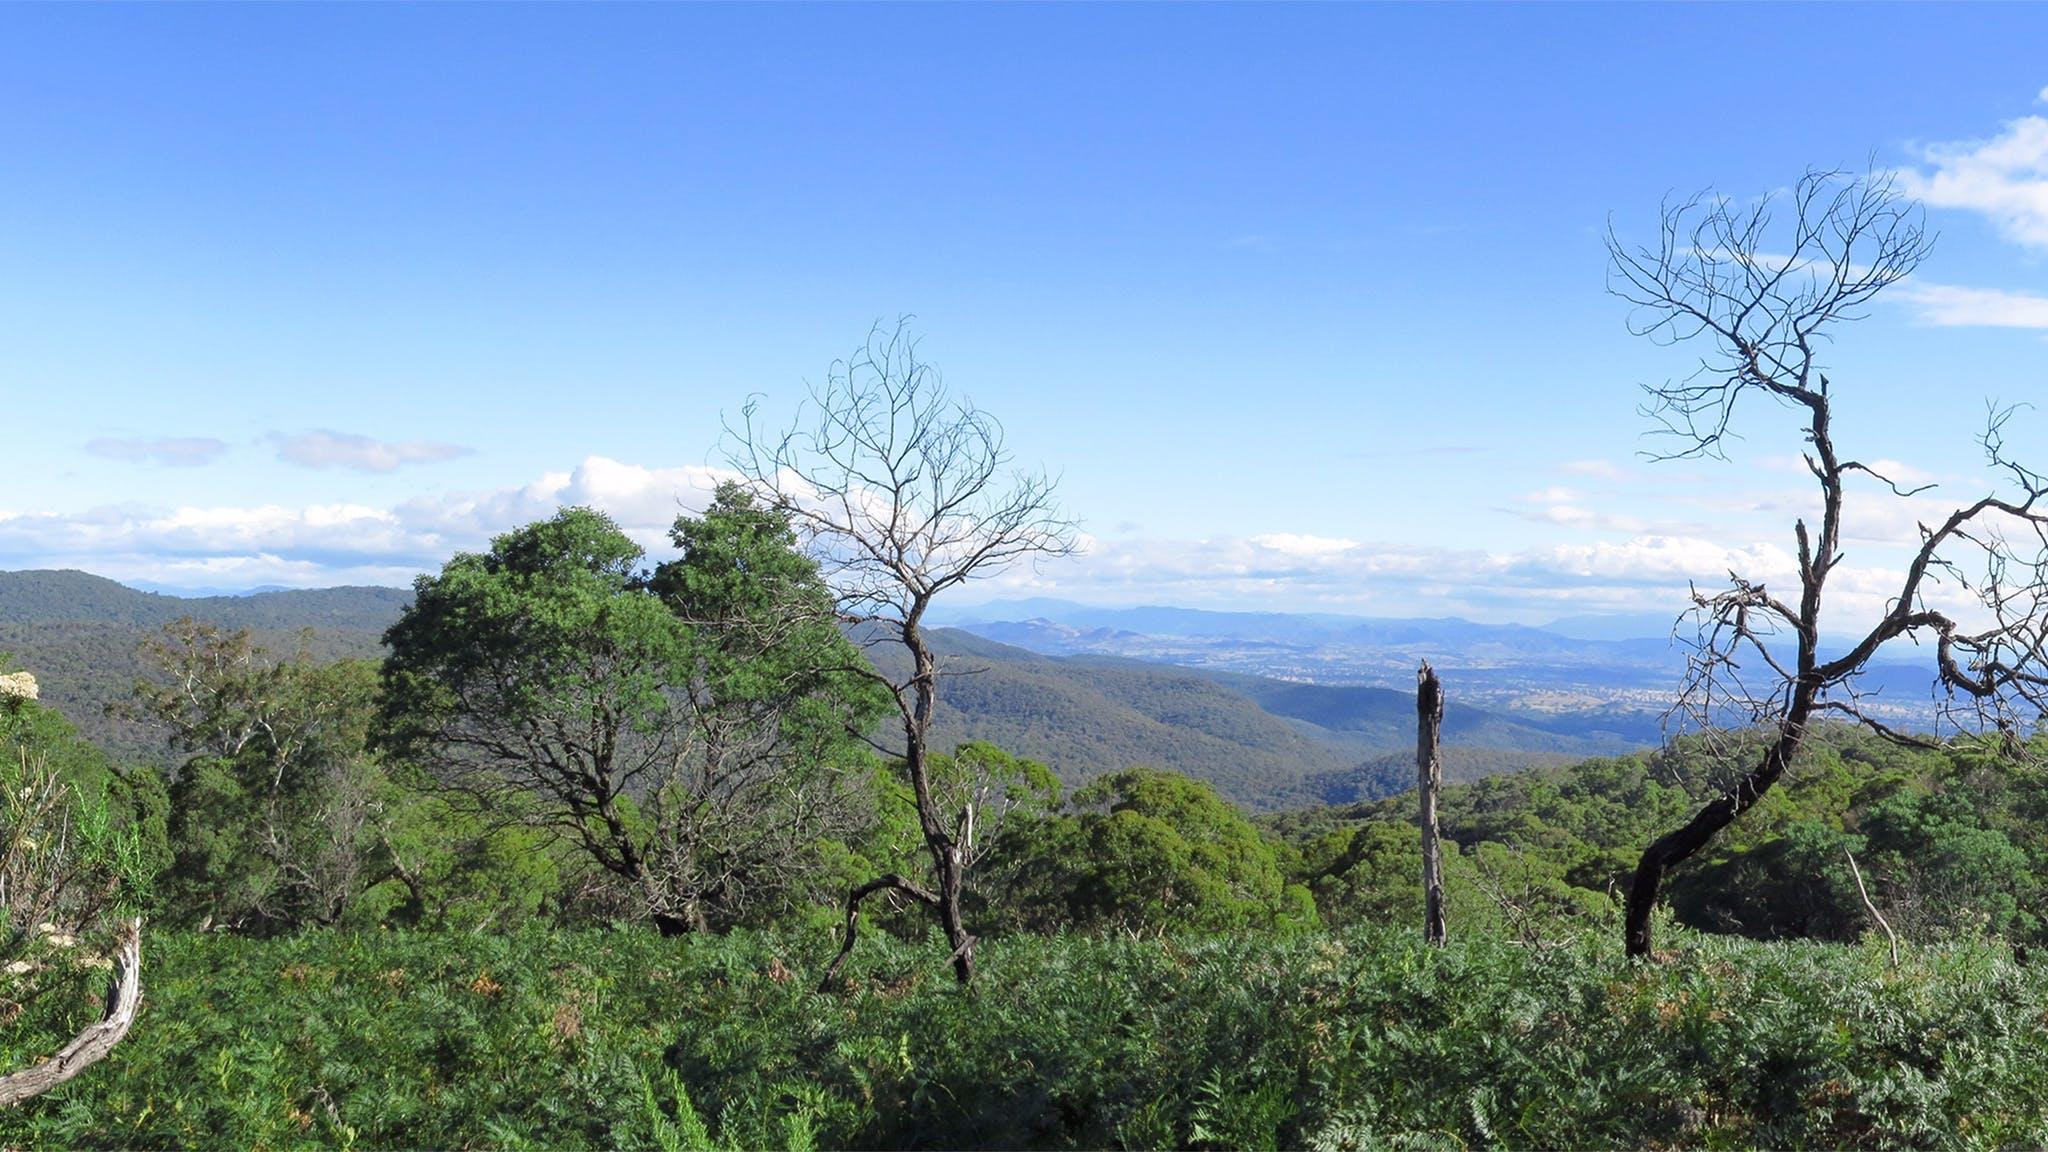 Mt Samaria